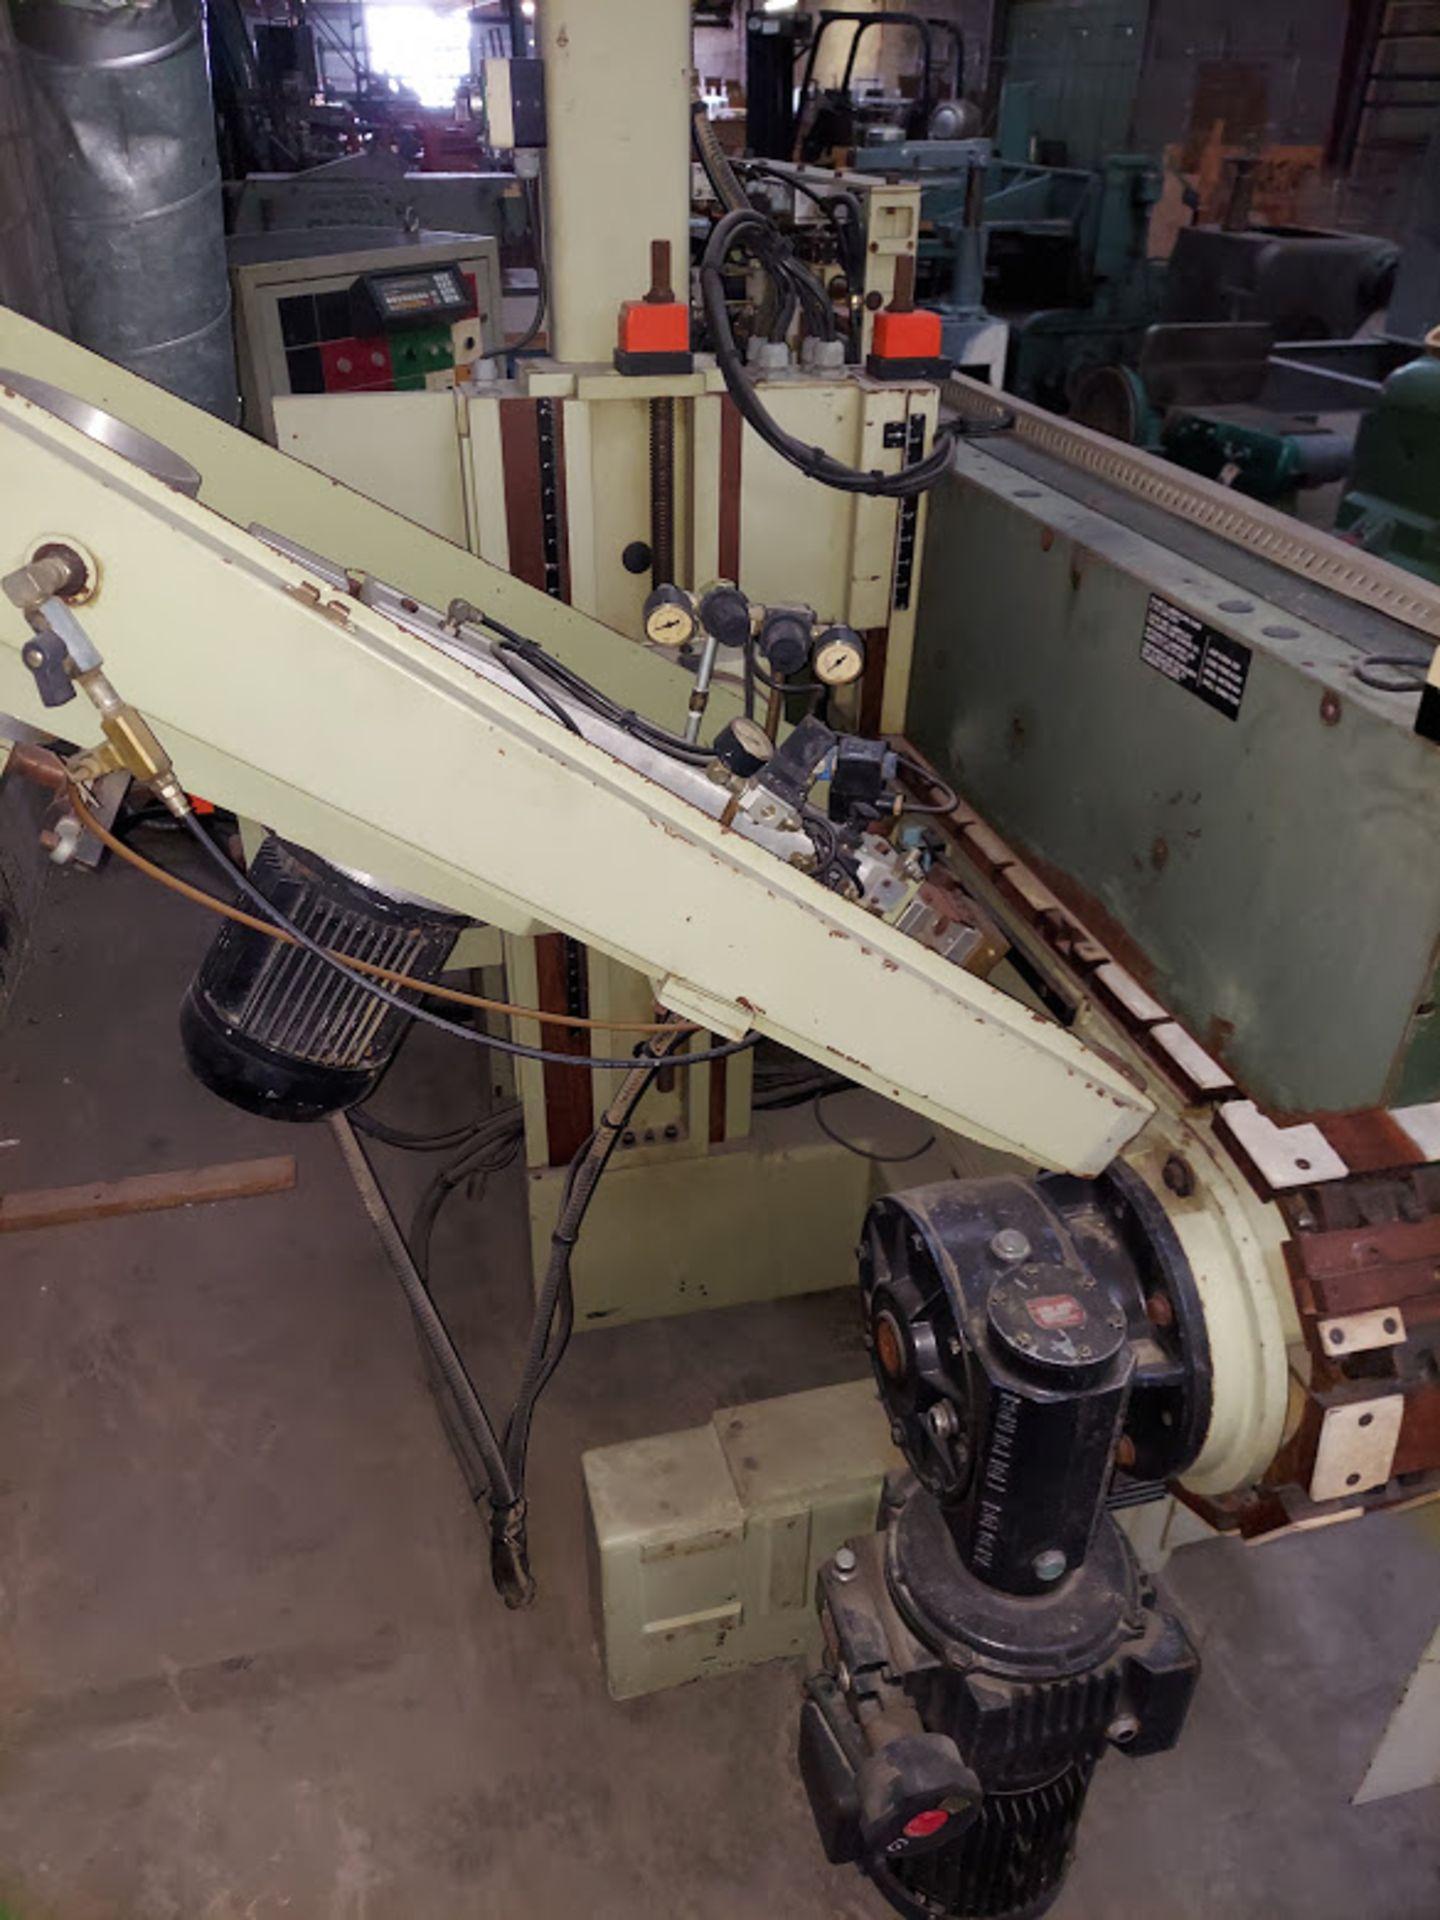 SCMI Center Machine, Model #Center, 1 - Shaper Head 230 Volt 3 Phase, Sanding Station, Power Feed - Image 5 of 7